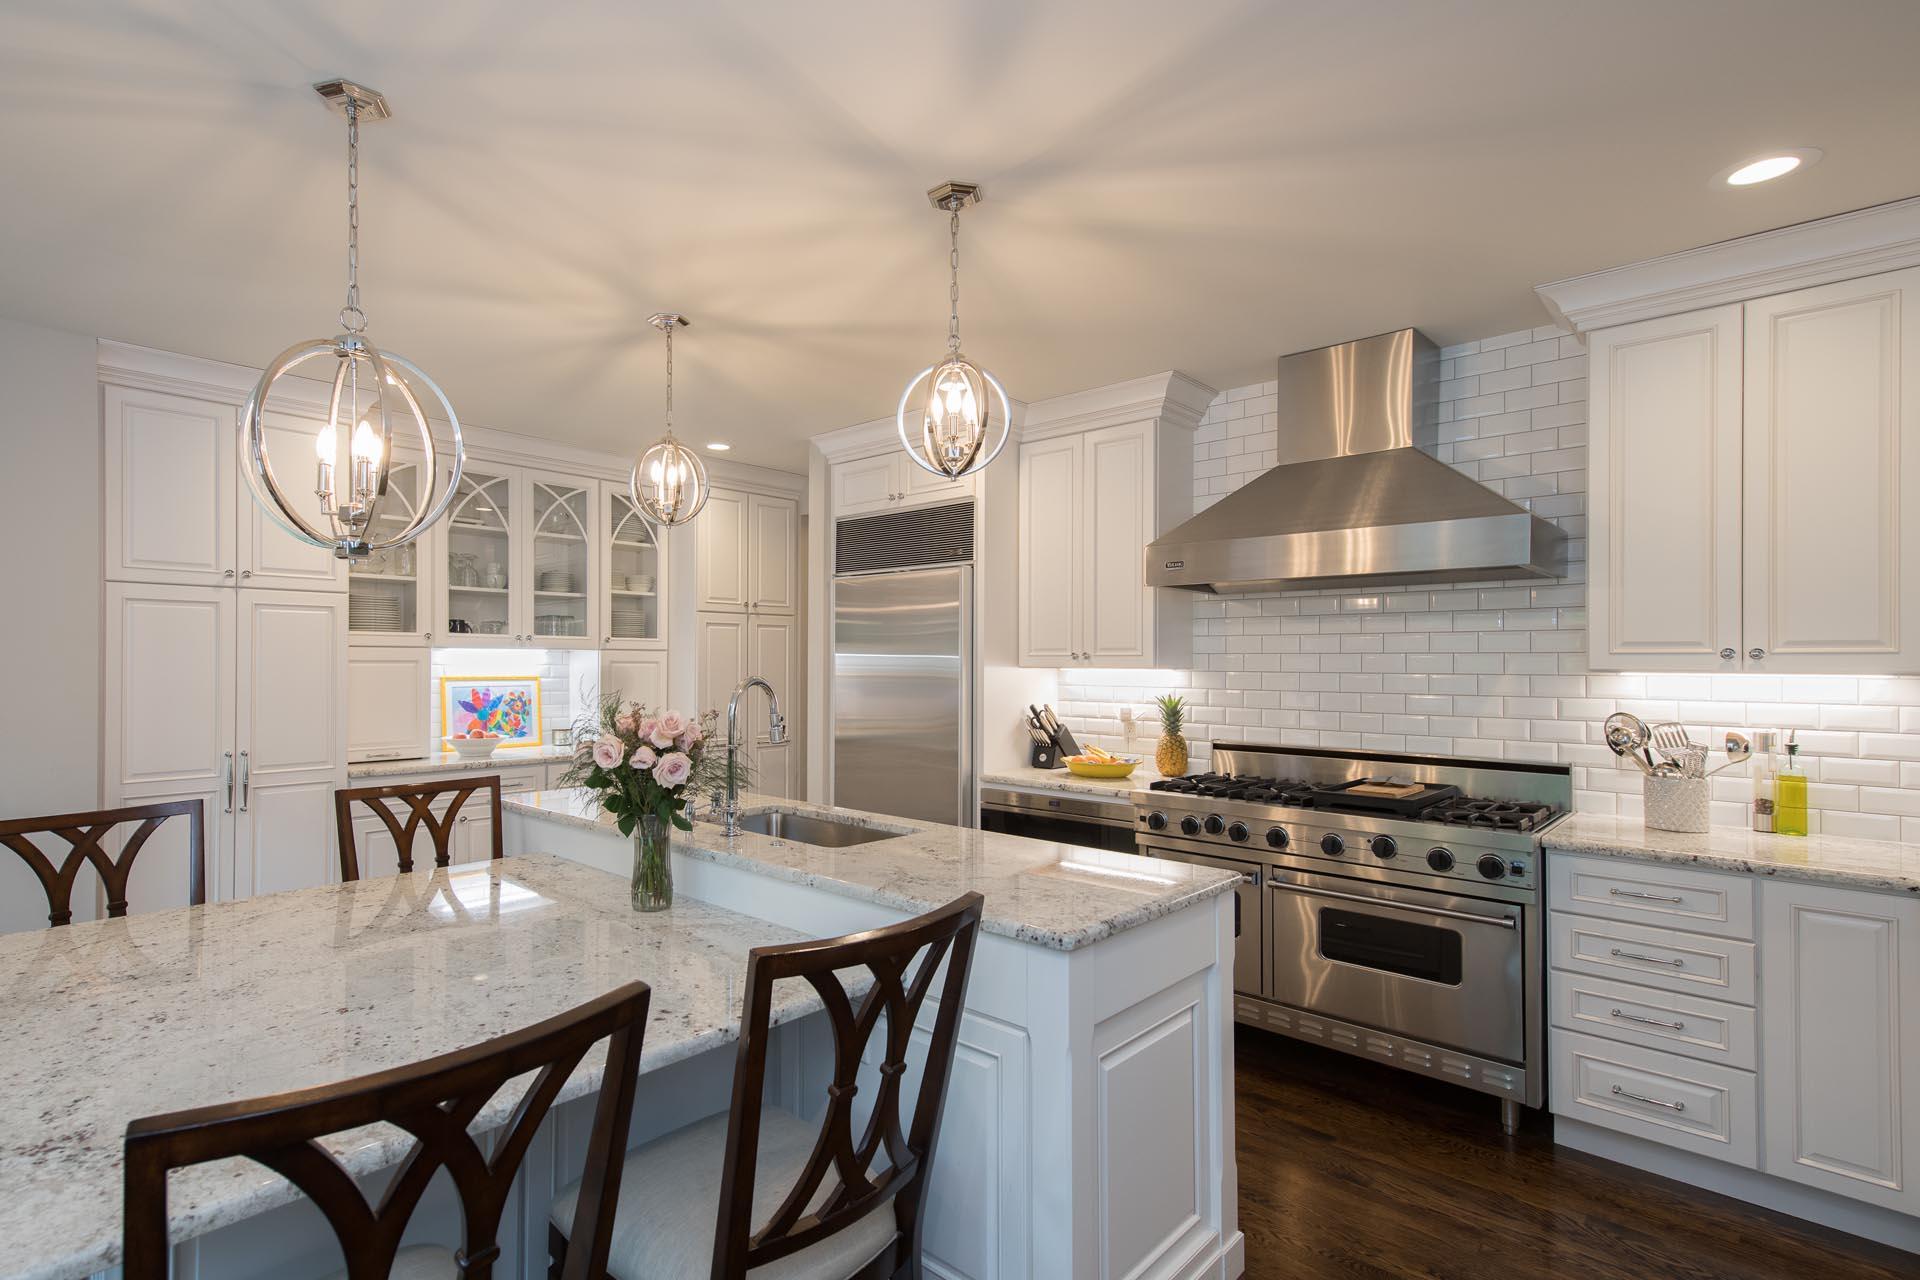 Sink and Faucet | Kitchen Renovation | Saginaw, MI